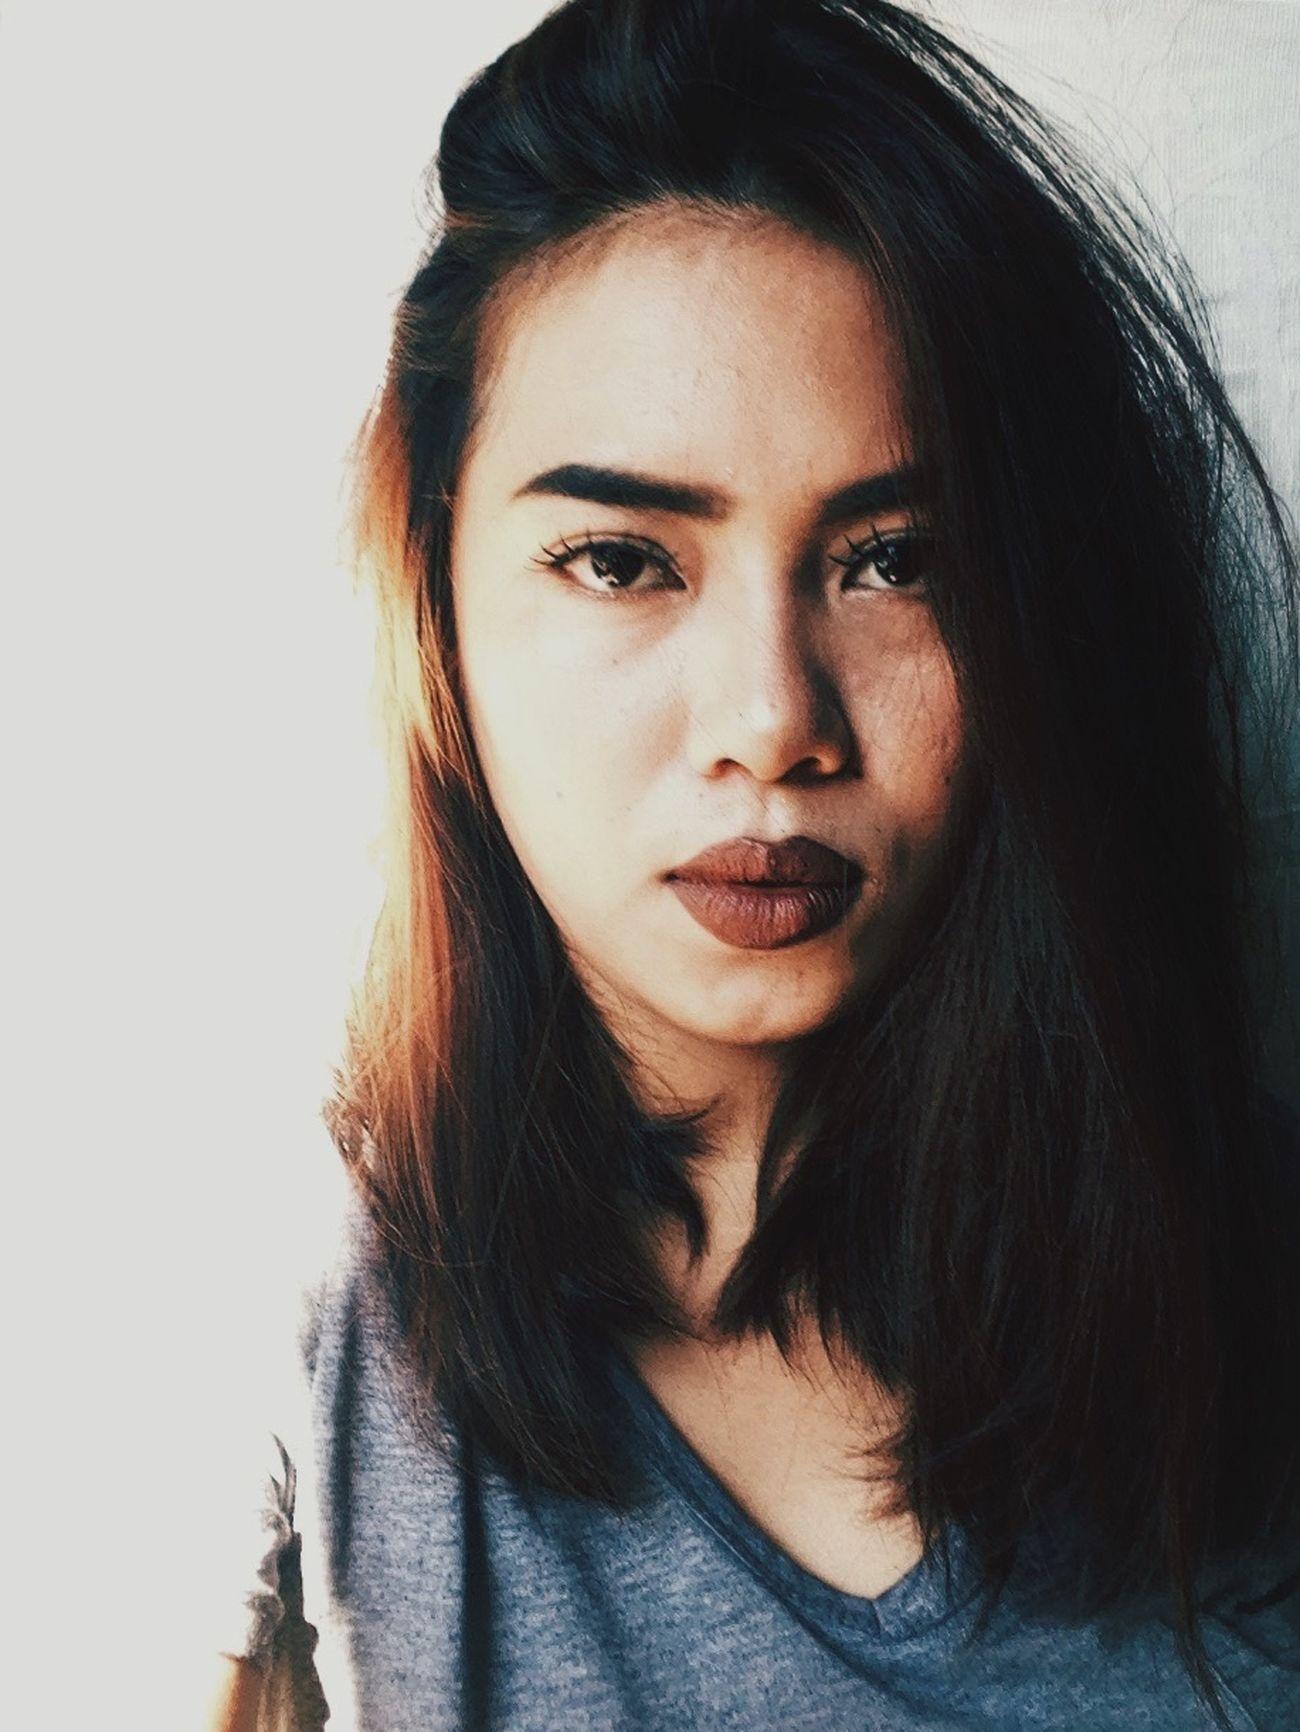 Enjoying Life Self Portrait Selfie ✌ Side Hair' ❤️